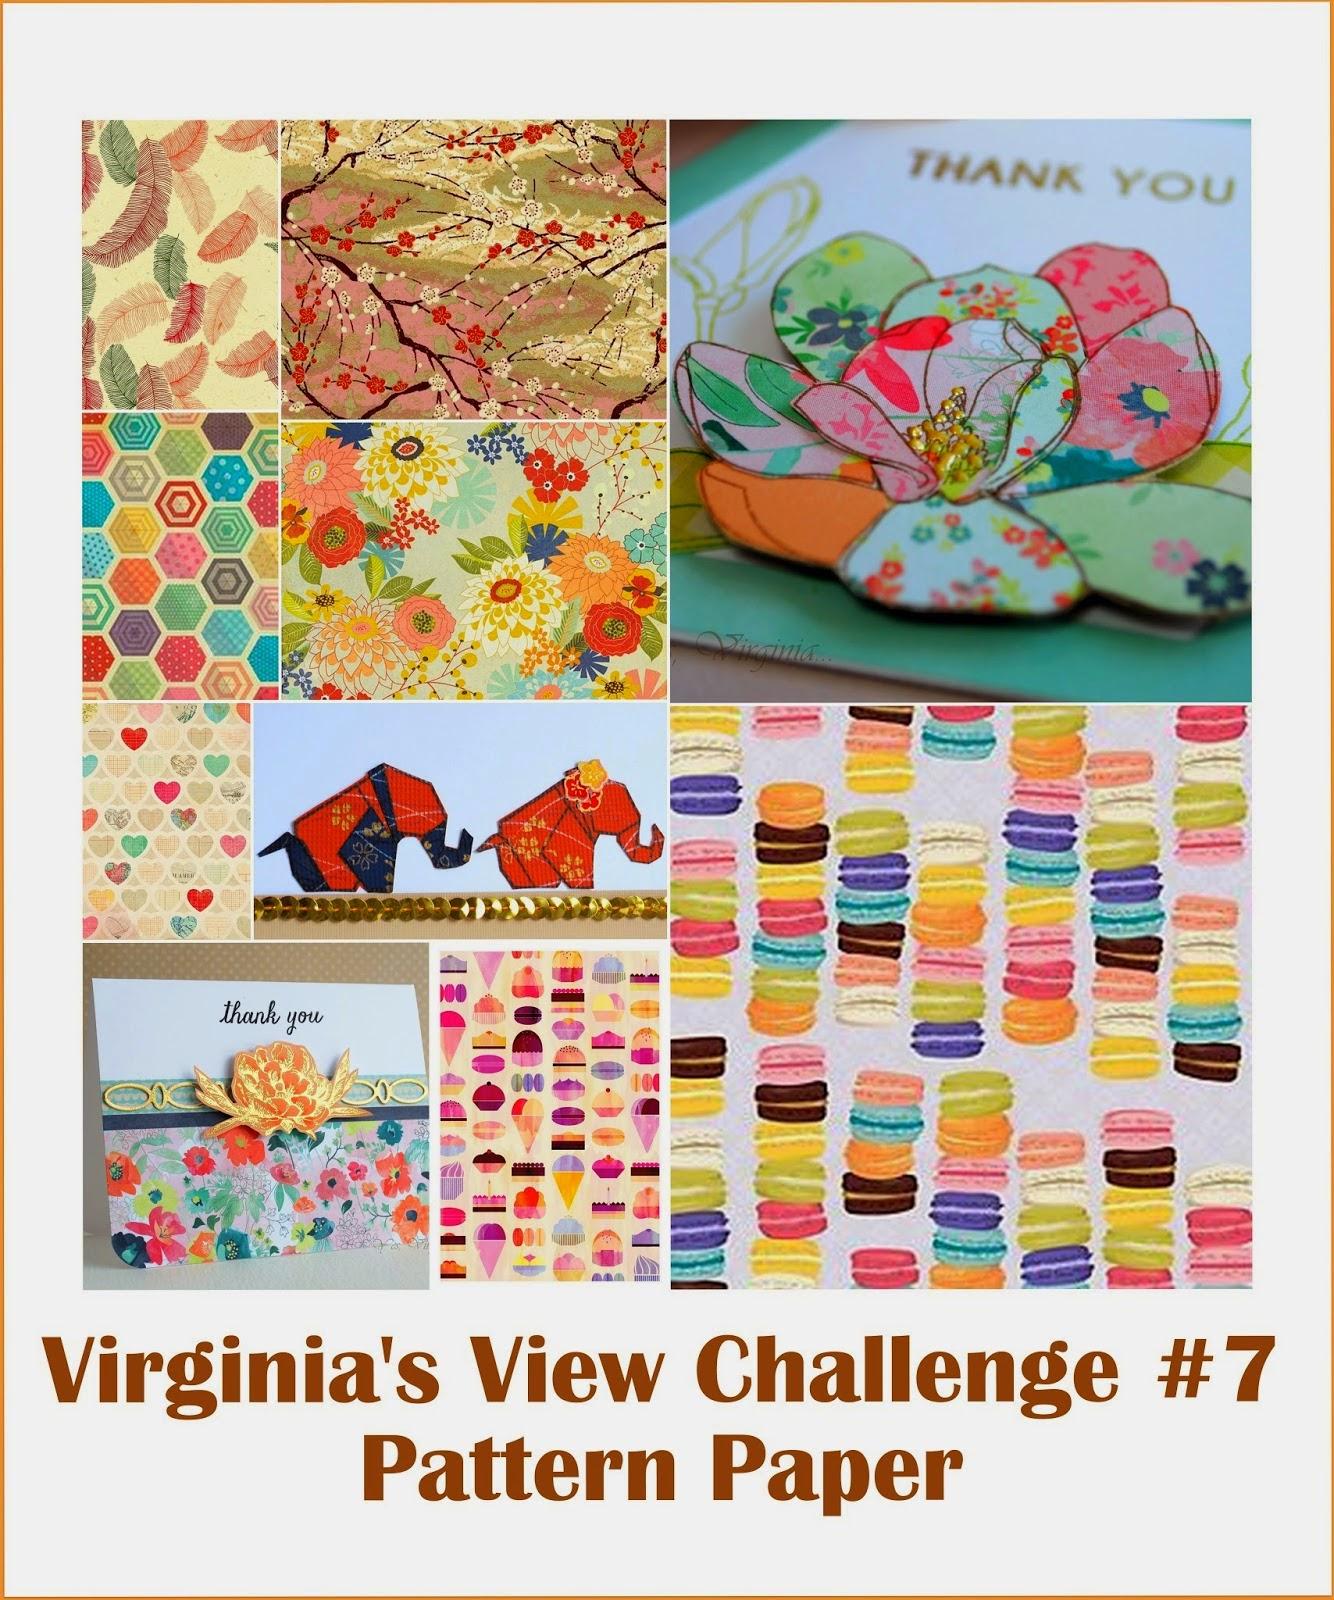 http://virginiasviewchallenge.blogspot.com.au/2014/09/virginias-view-challenge-7.html